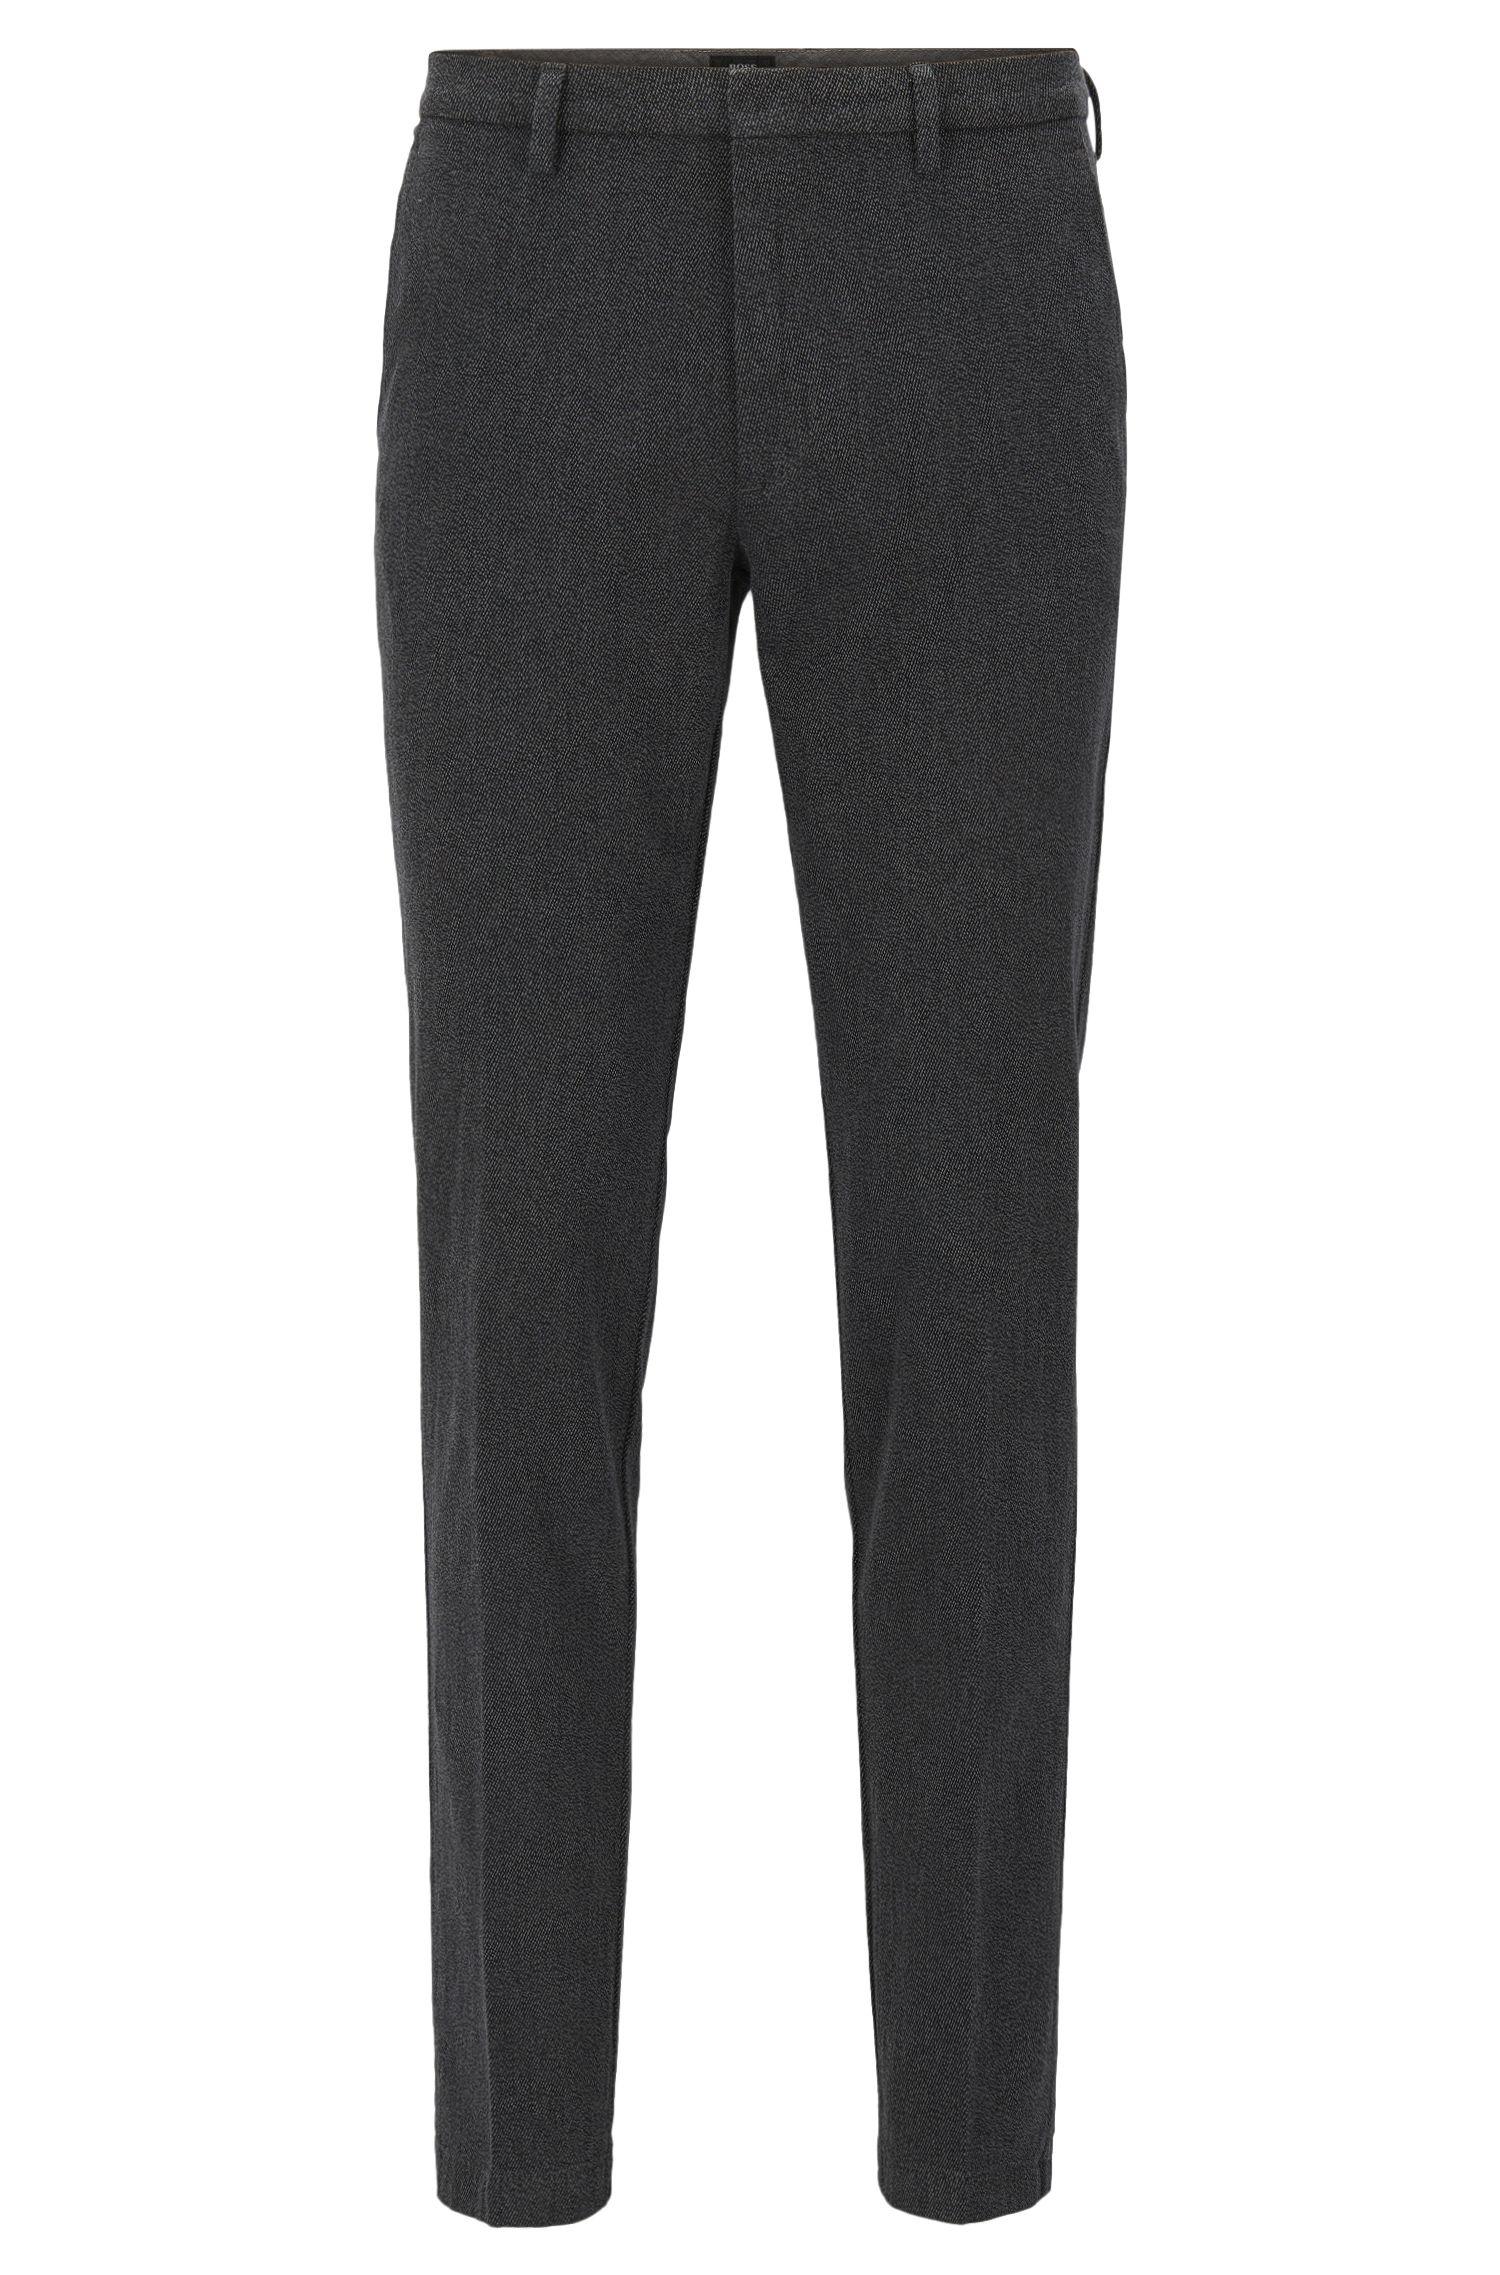 Cotton Stretch Twill Pants, Slim Fit | Kaito W